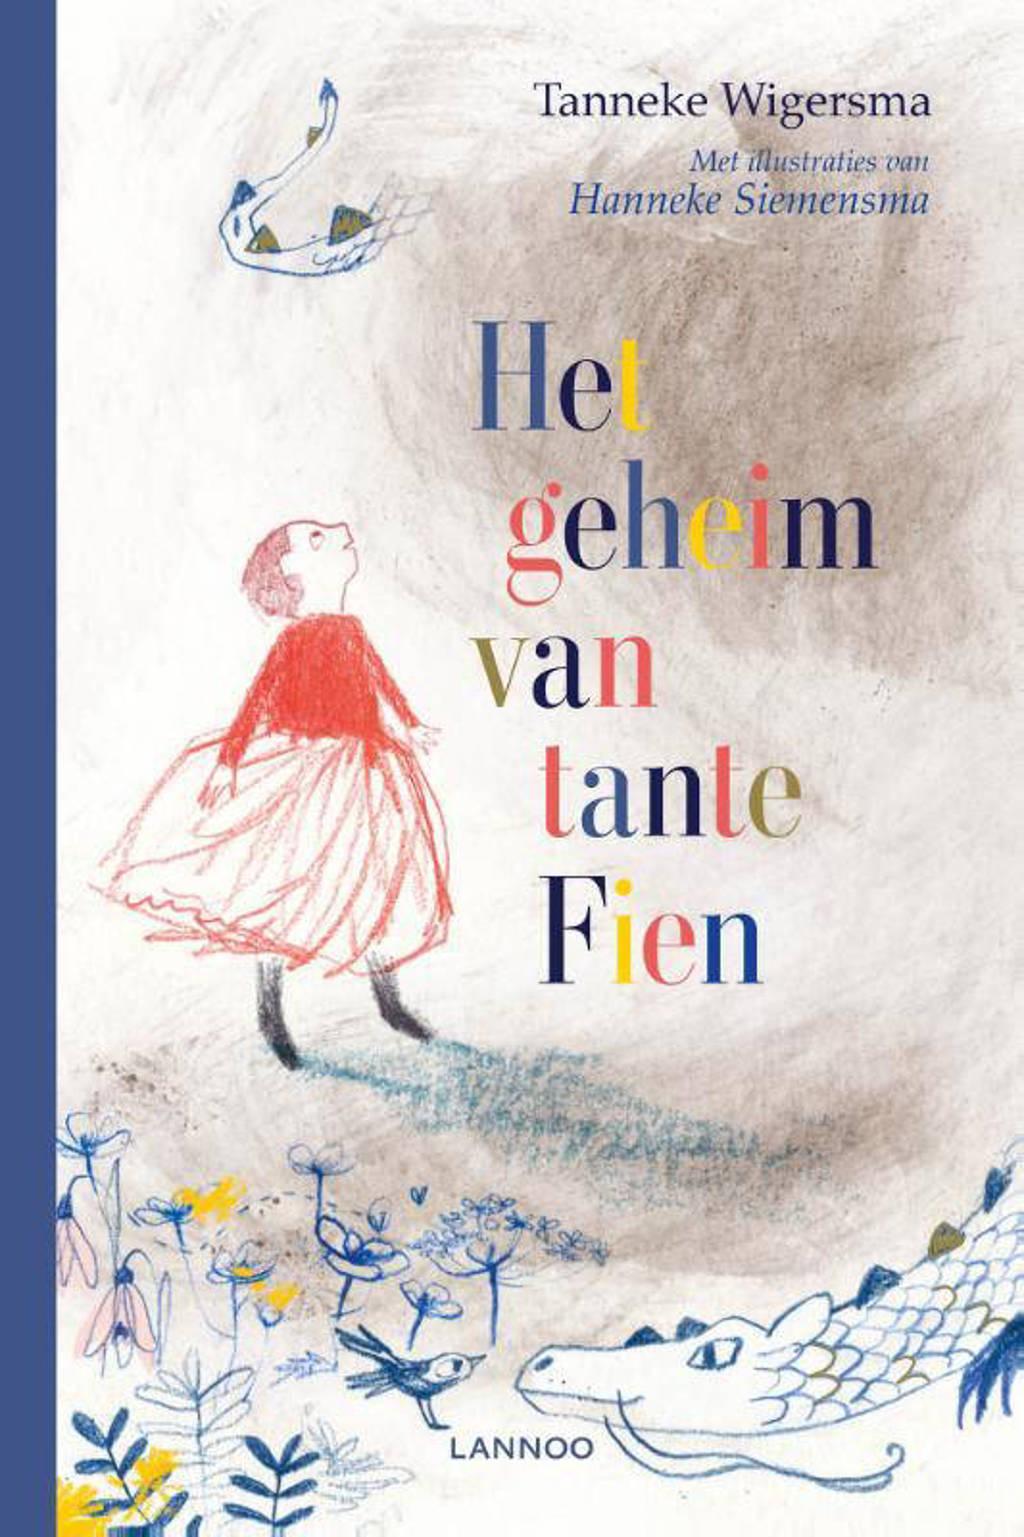 Het geheim van tante Fien - Tanneke Wigersma